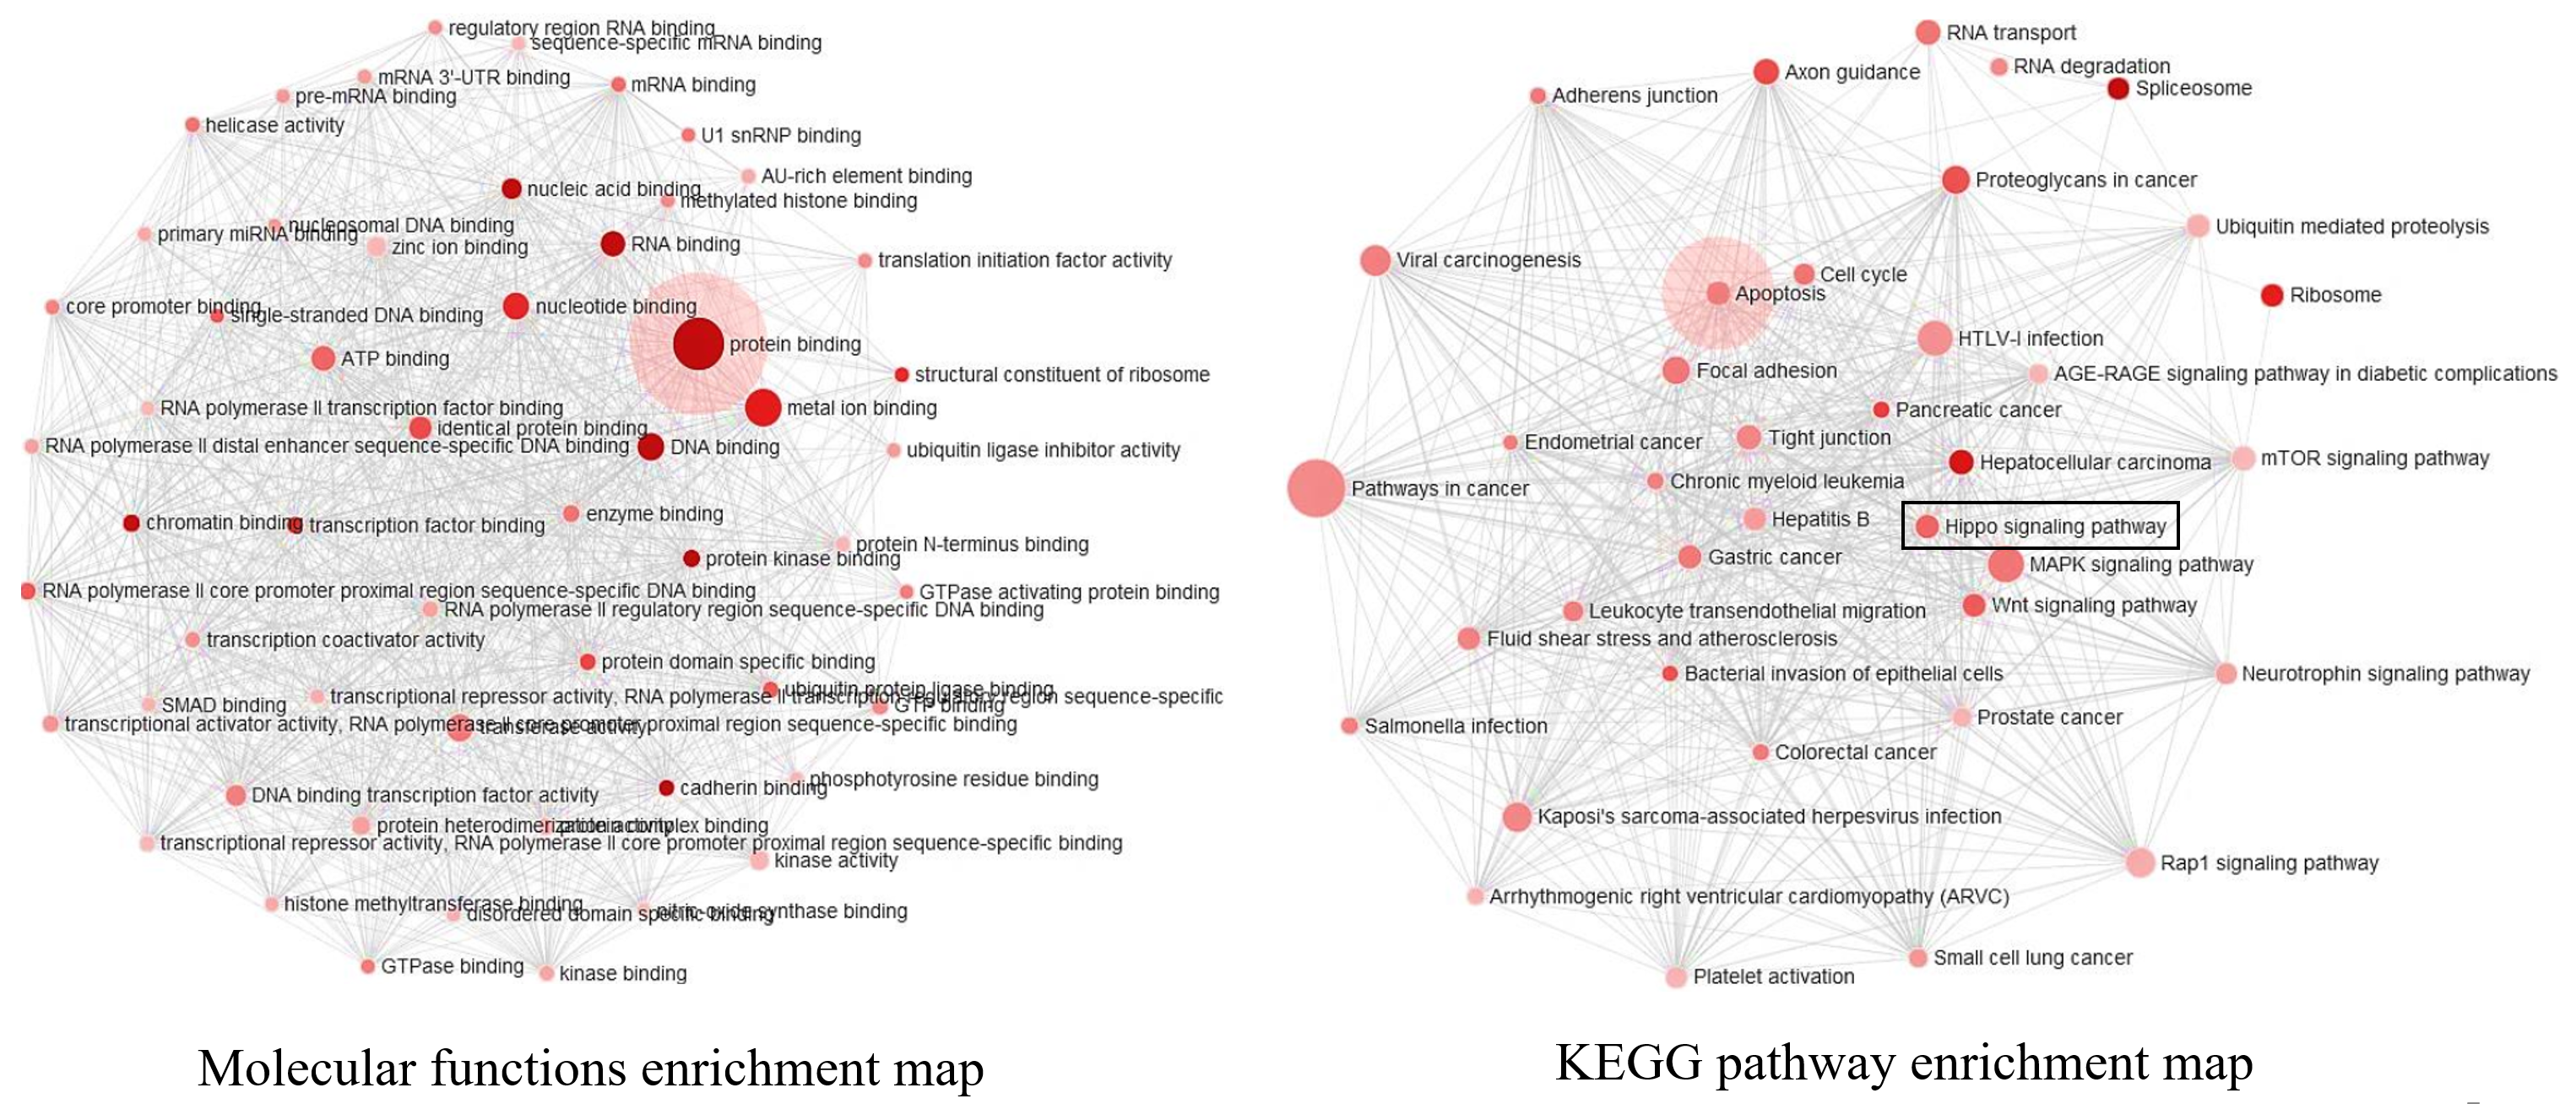 Sox4 ChIP-Seq data analysis | CityU-Bioinformatics